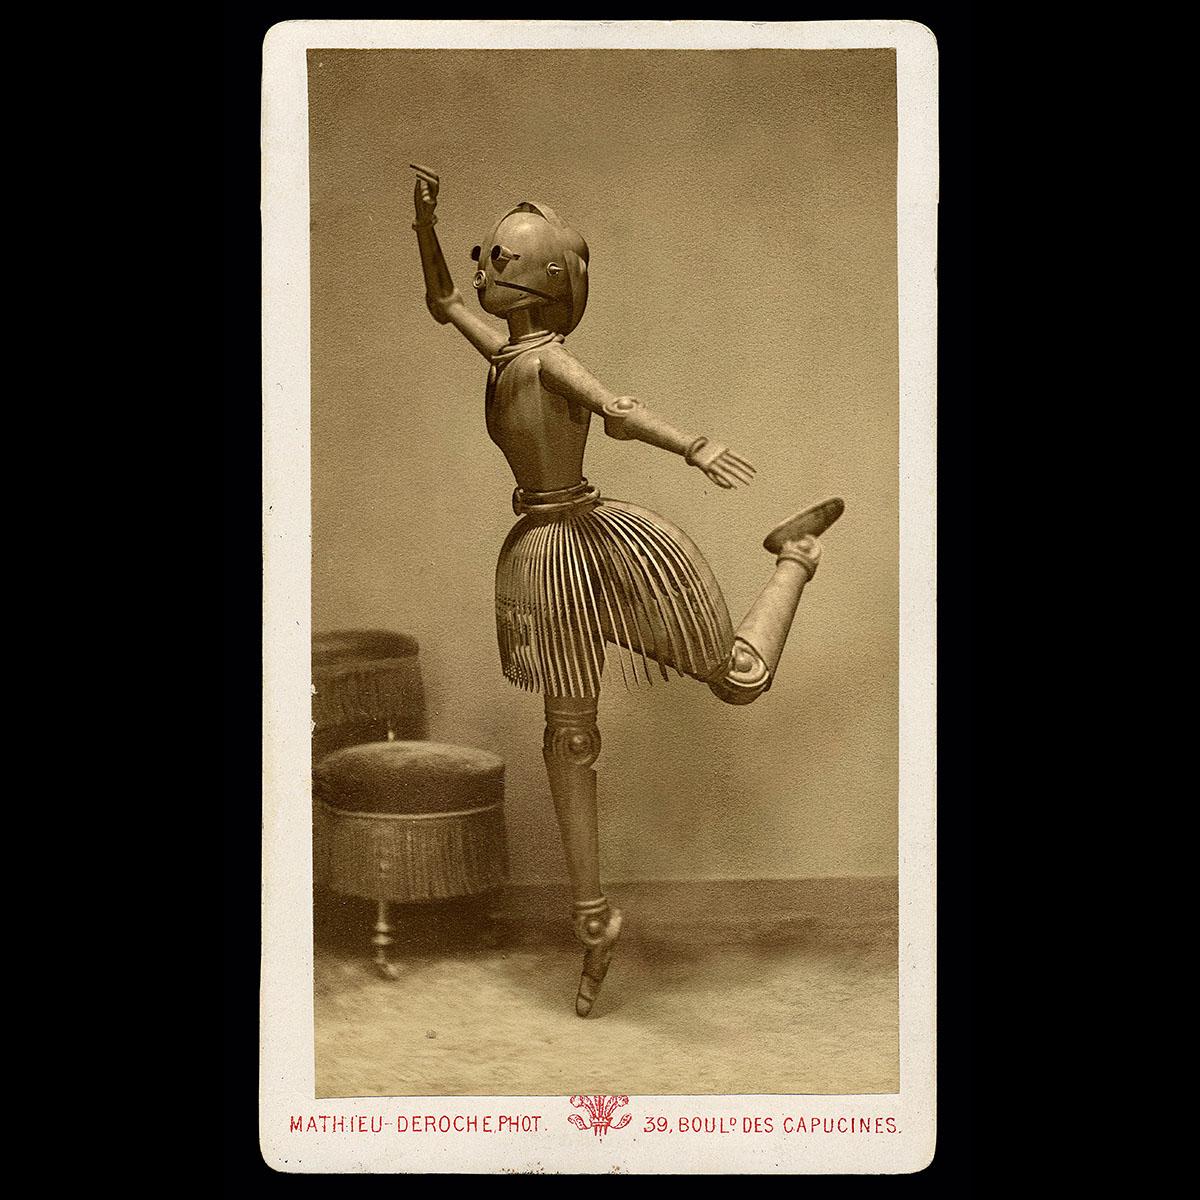 Robot Ballet, Ed Bateman